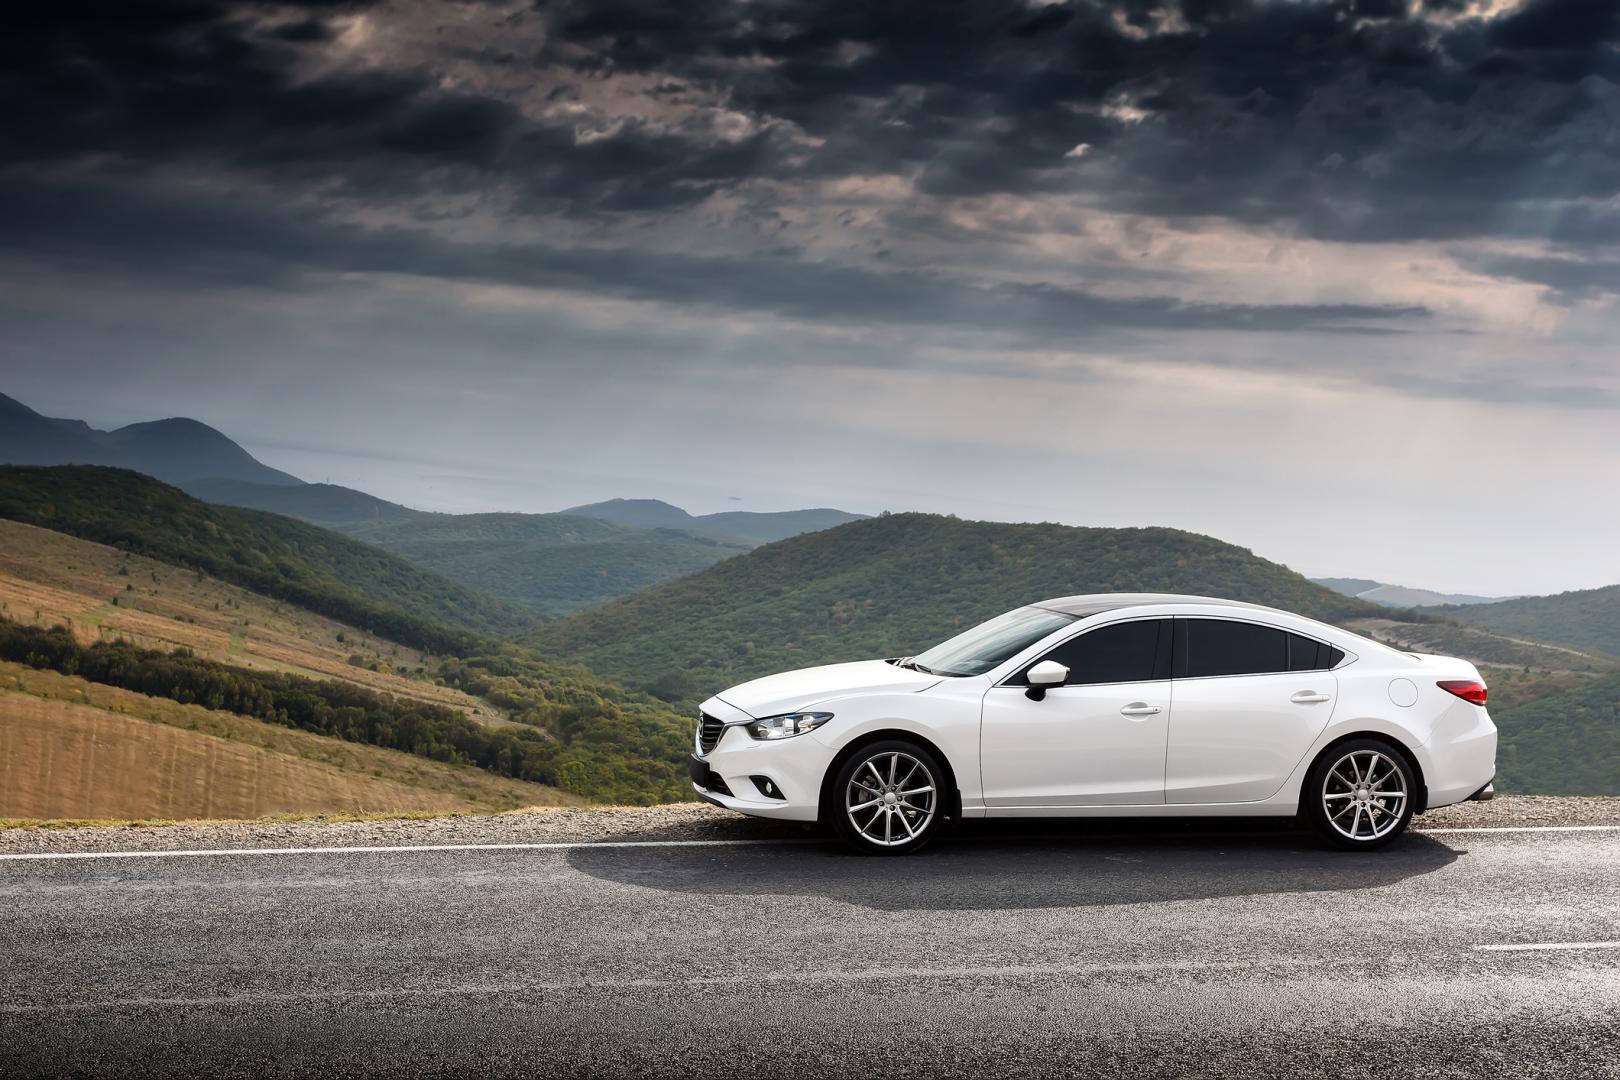 White Car Mazda 6 parket at countryside asphalt road